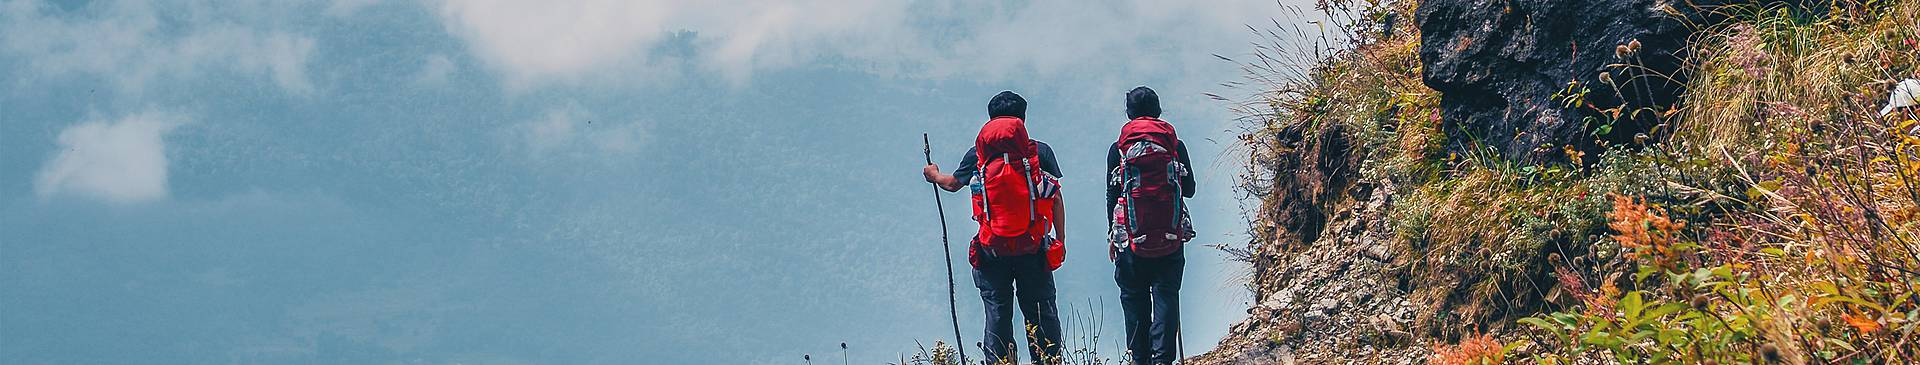 Bergurlaub Ruanda